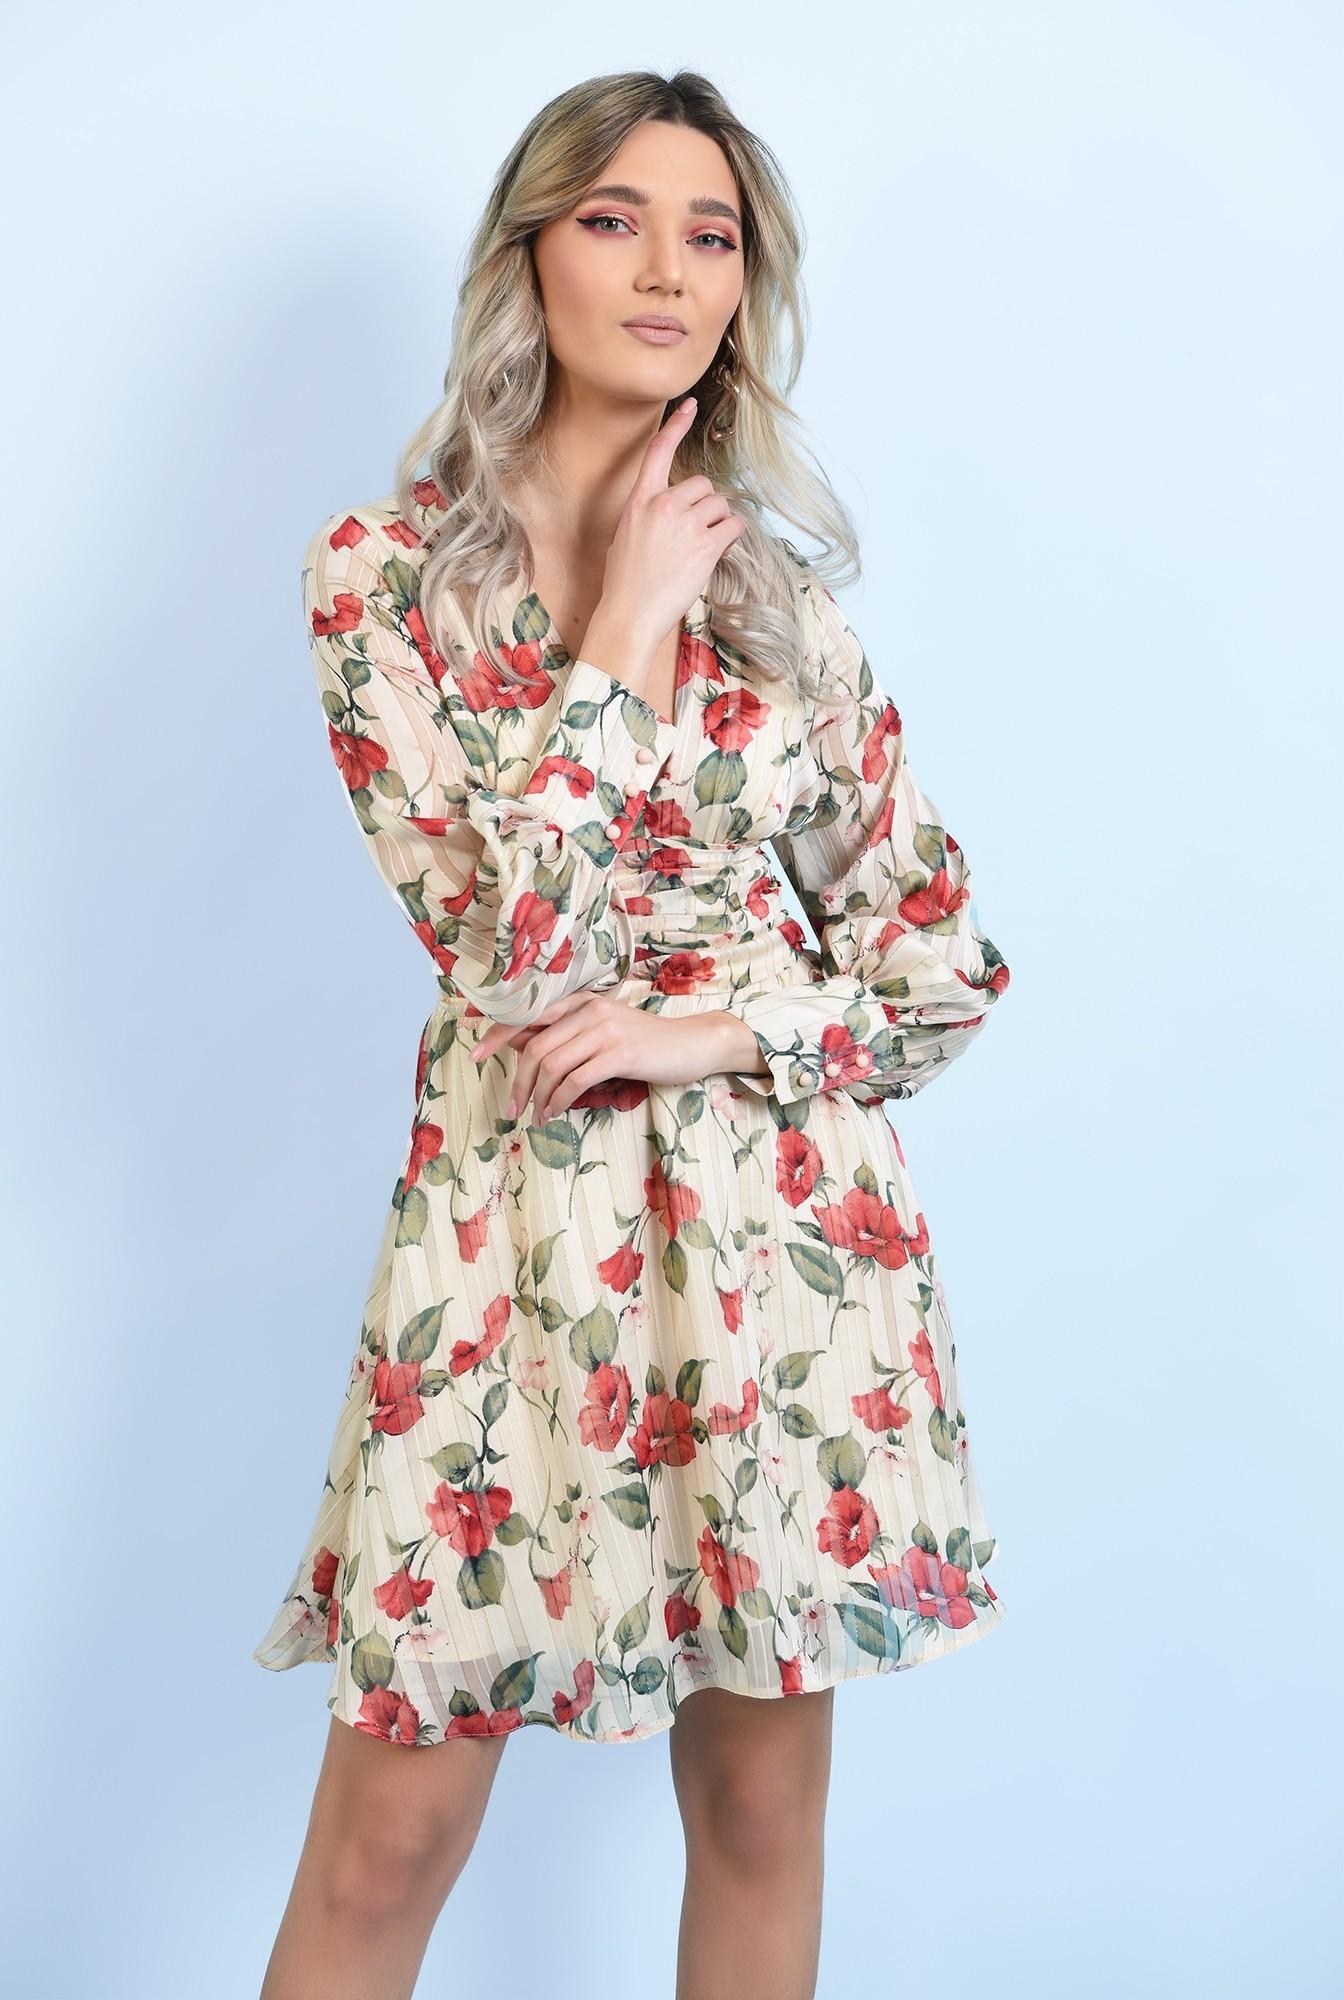 0 - rochie mini, din sifon, cu flori, maneci lungi, betelie fronsata